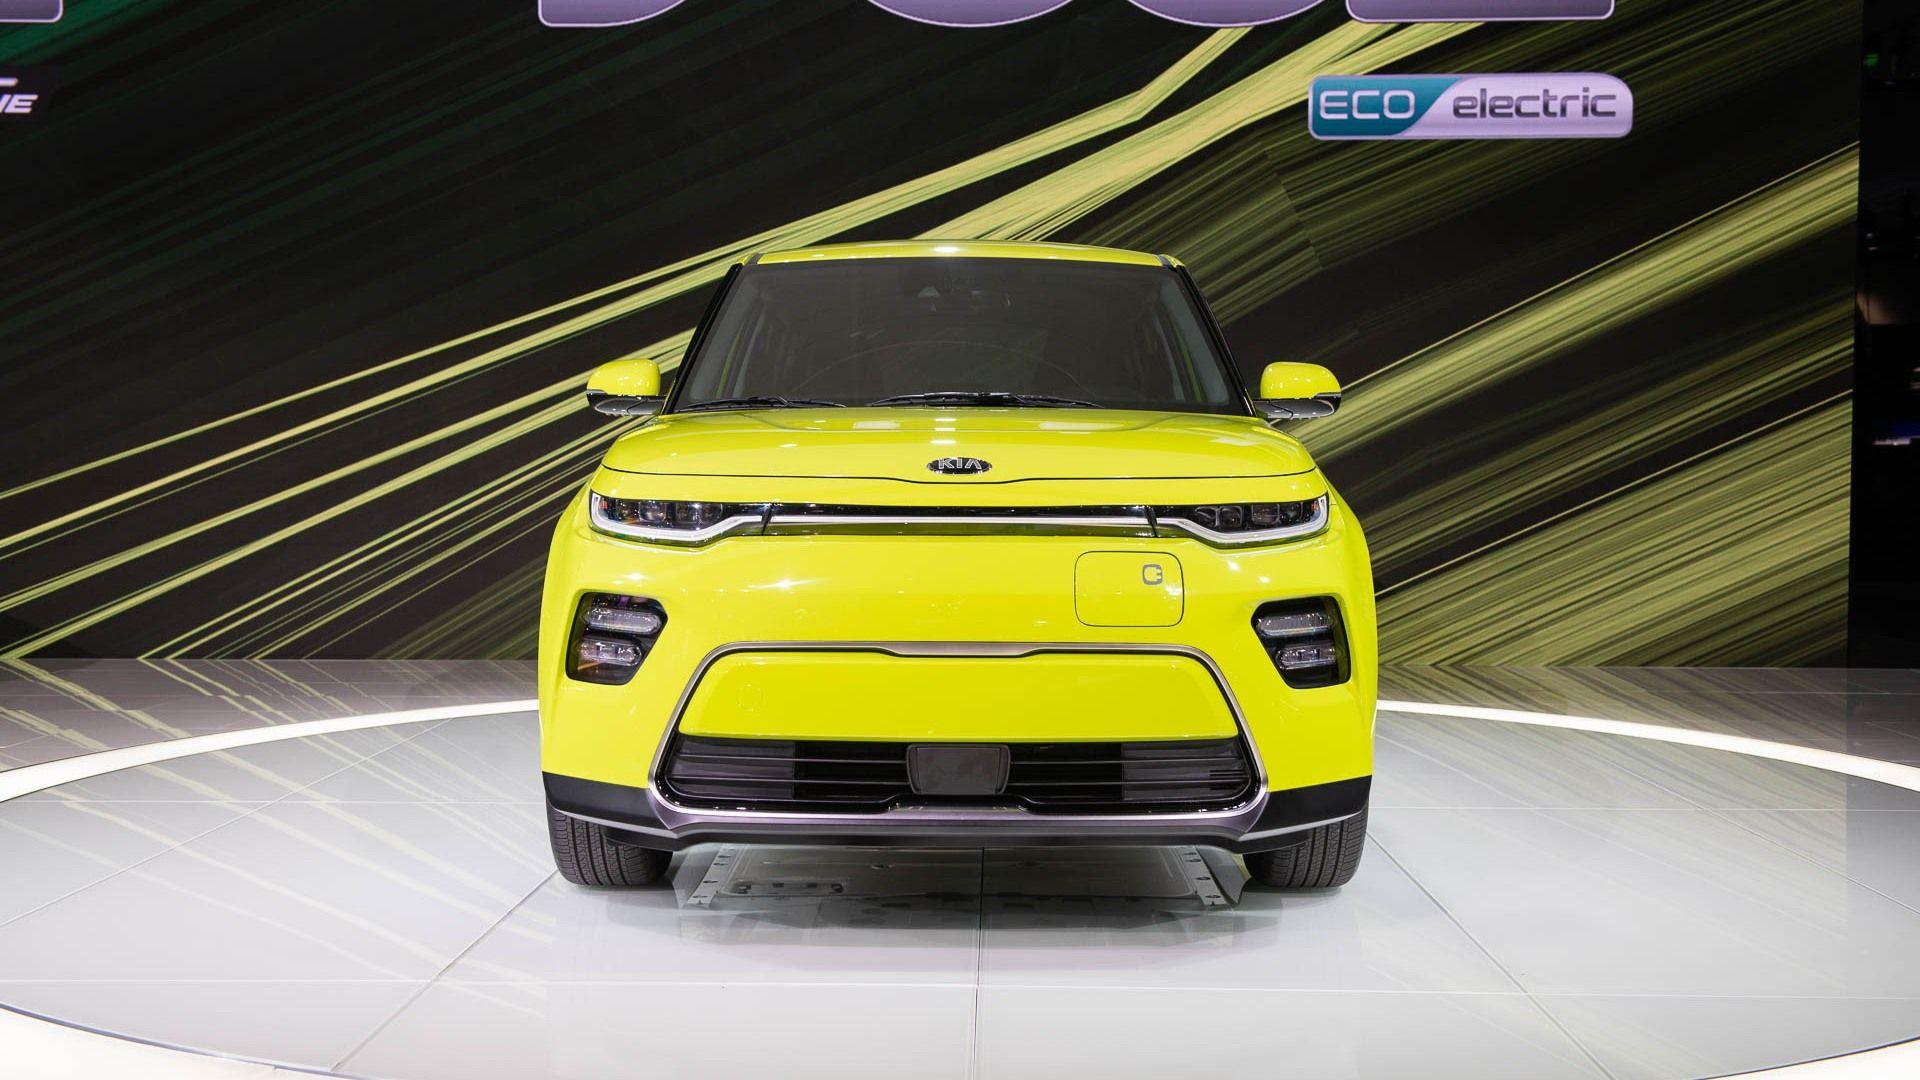 2021 Kia Soul Reviews in 2020 Kia soul, Kia, New cars